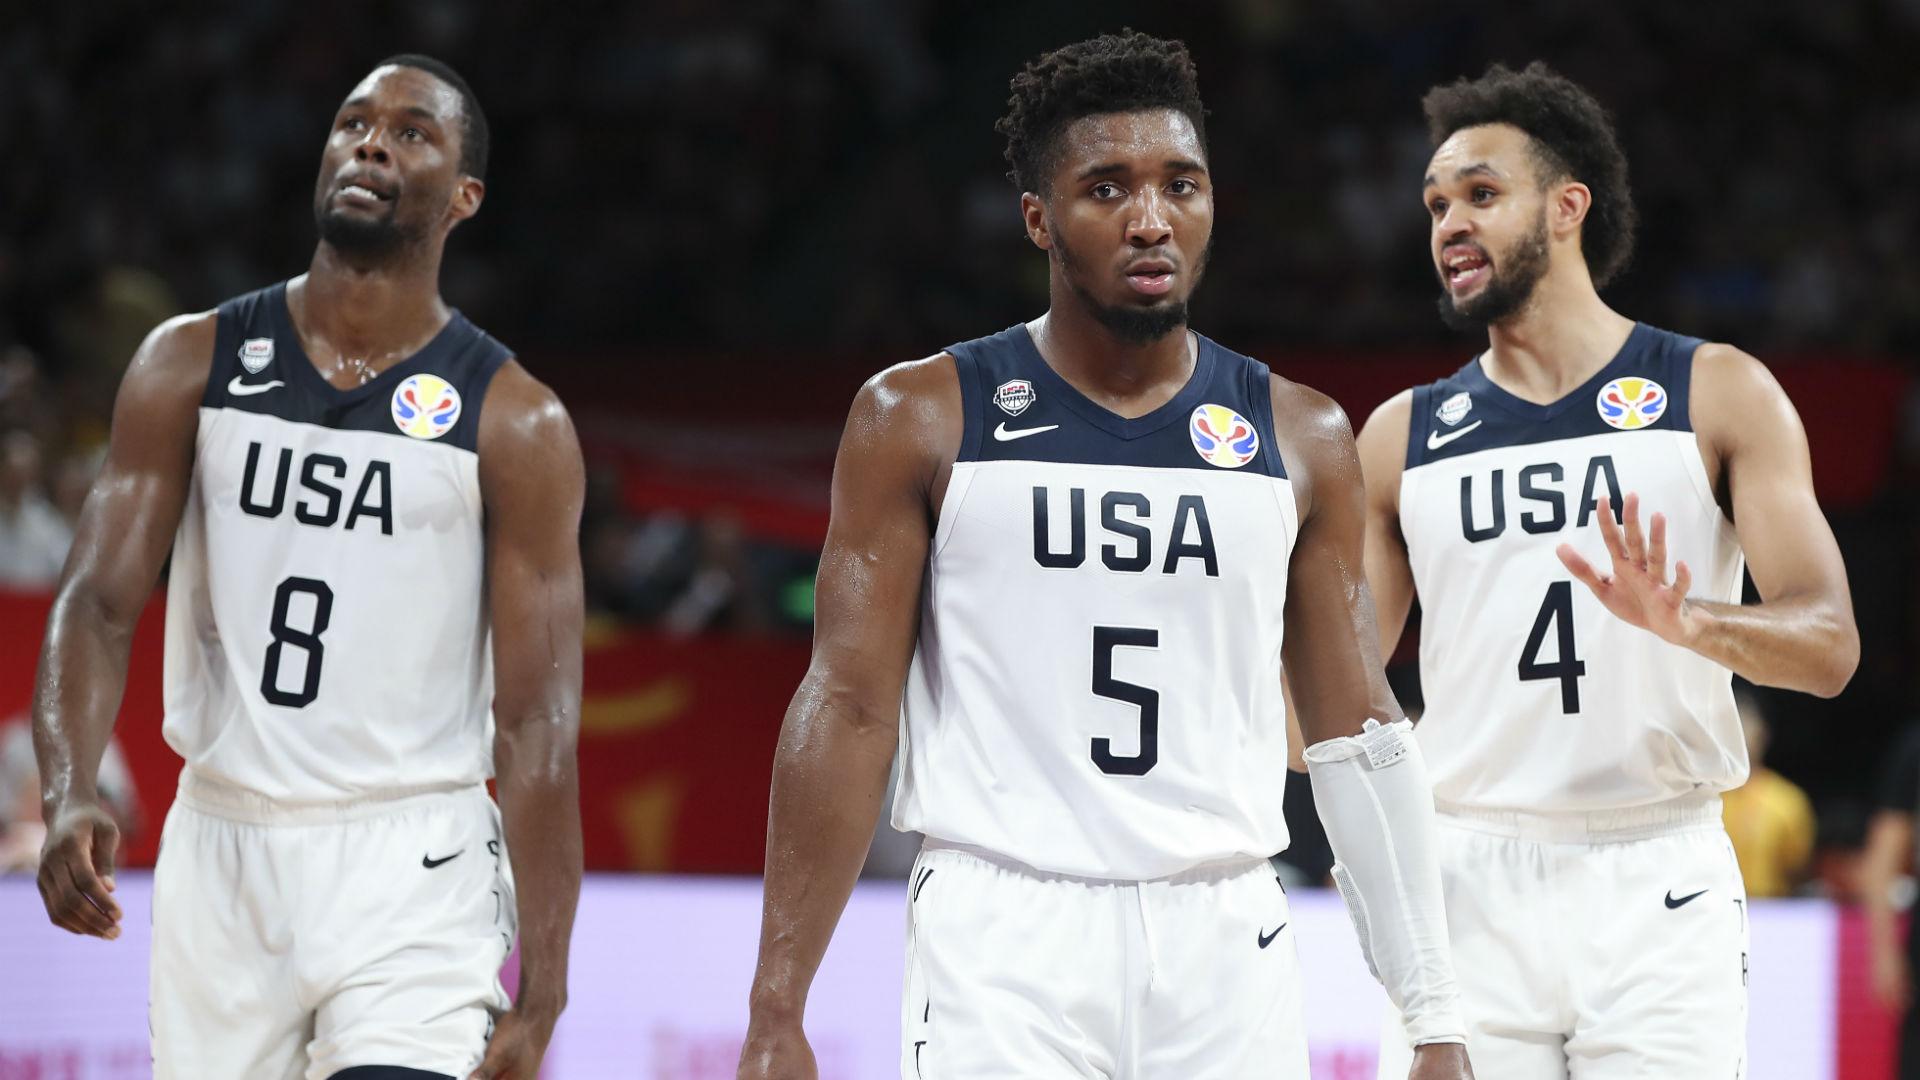 FIBA World Cup 2019: France snaps Team USA's international win streak